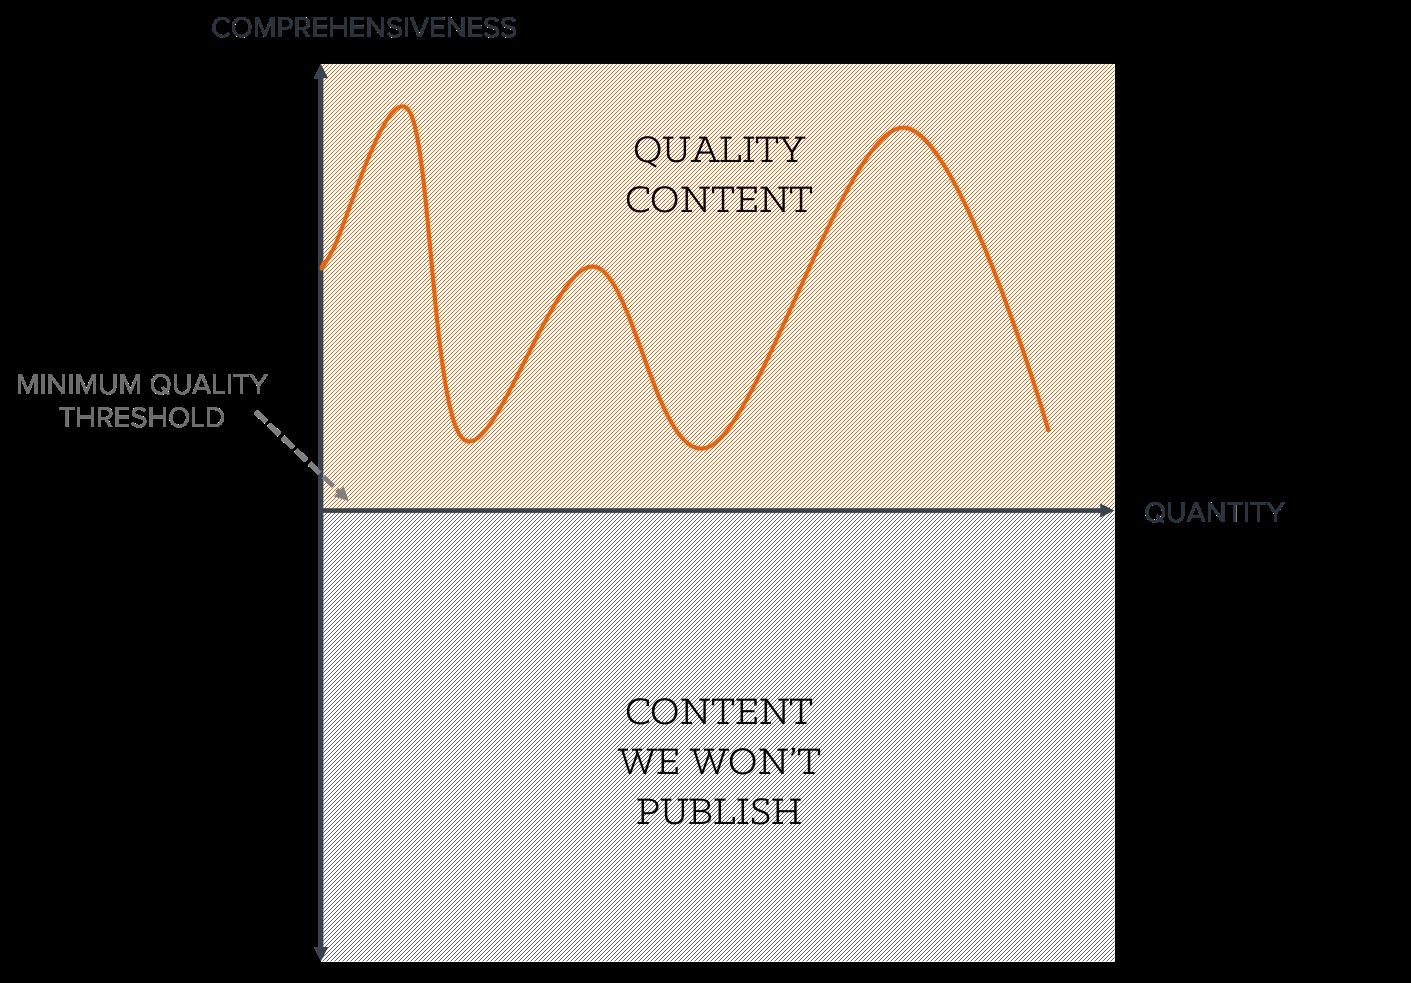 quality_vs_quantity-1.png